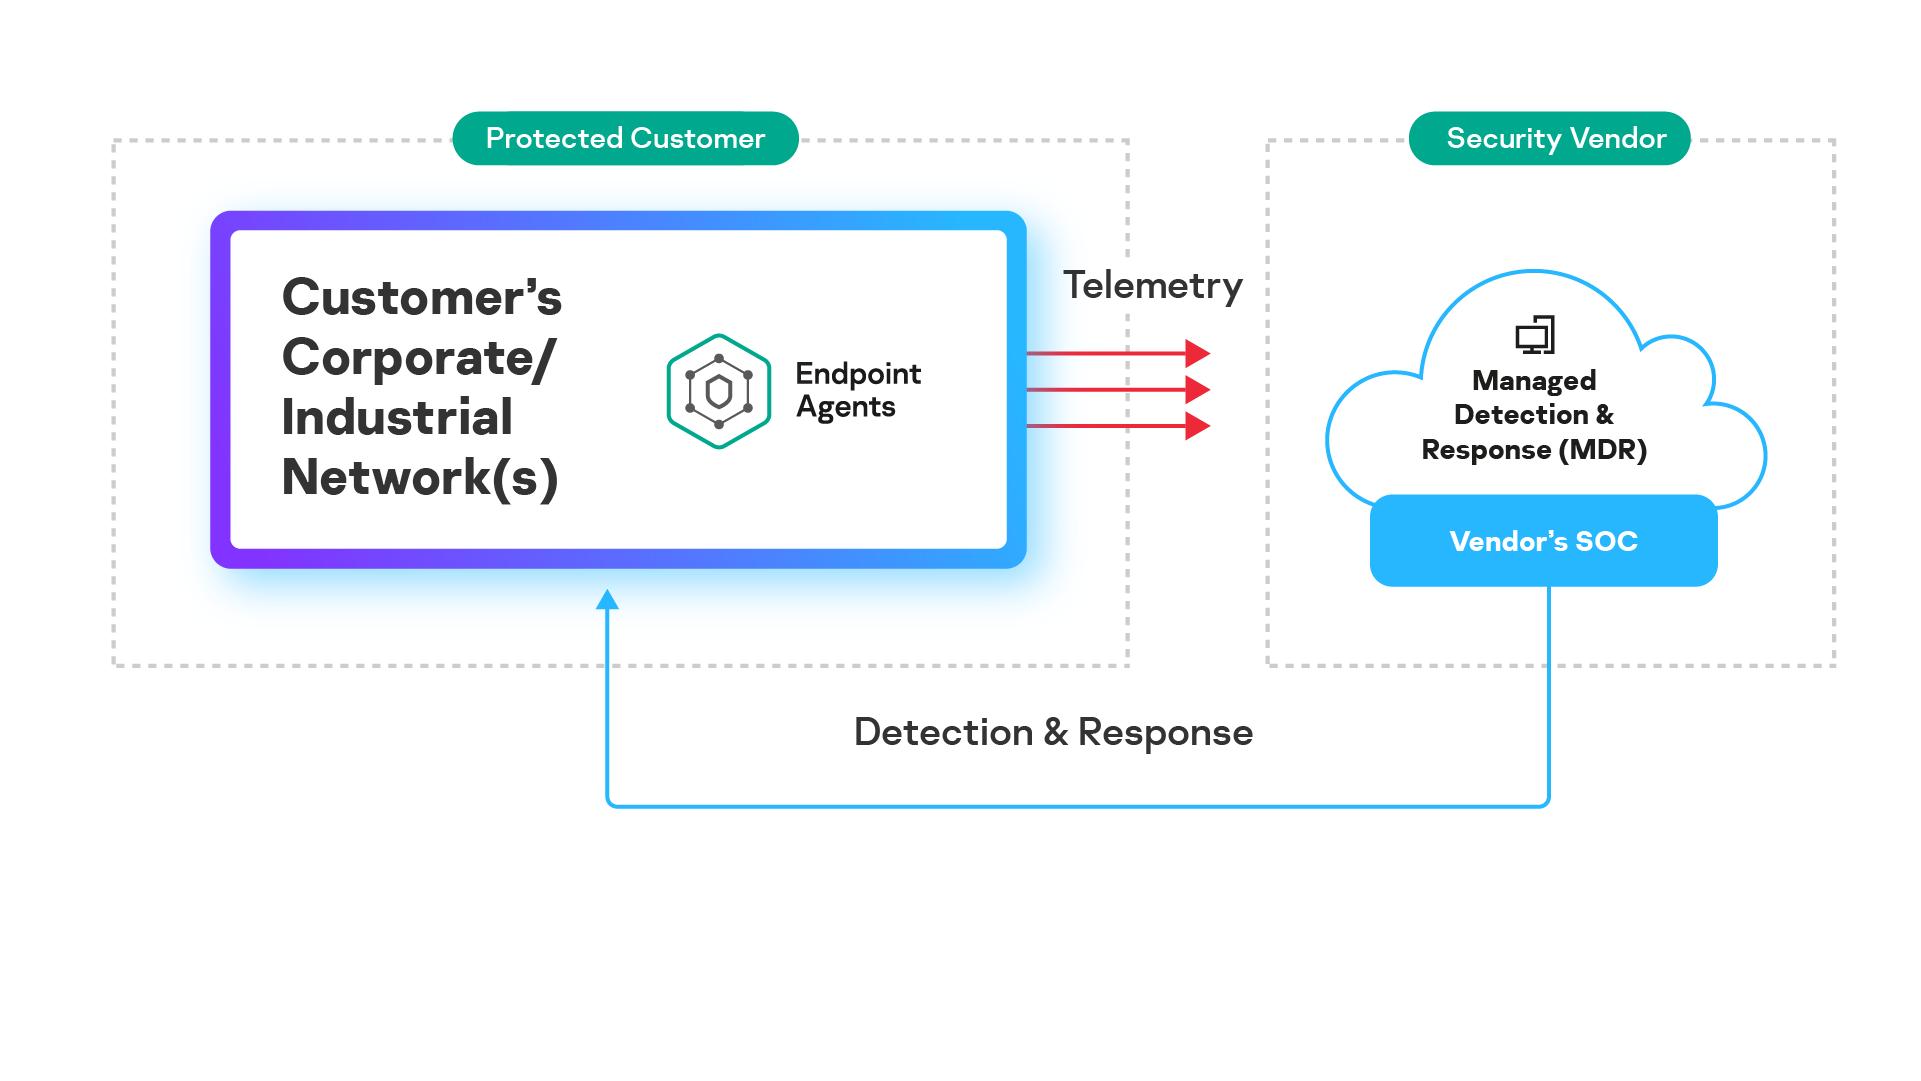 Risposta agli incidenti di Kaspersky (MDR): soluzione Security as a Service basata su una PaaS pubblica.